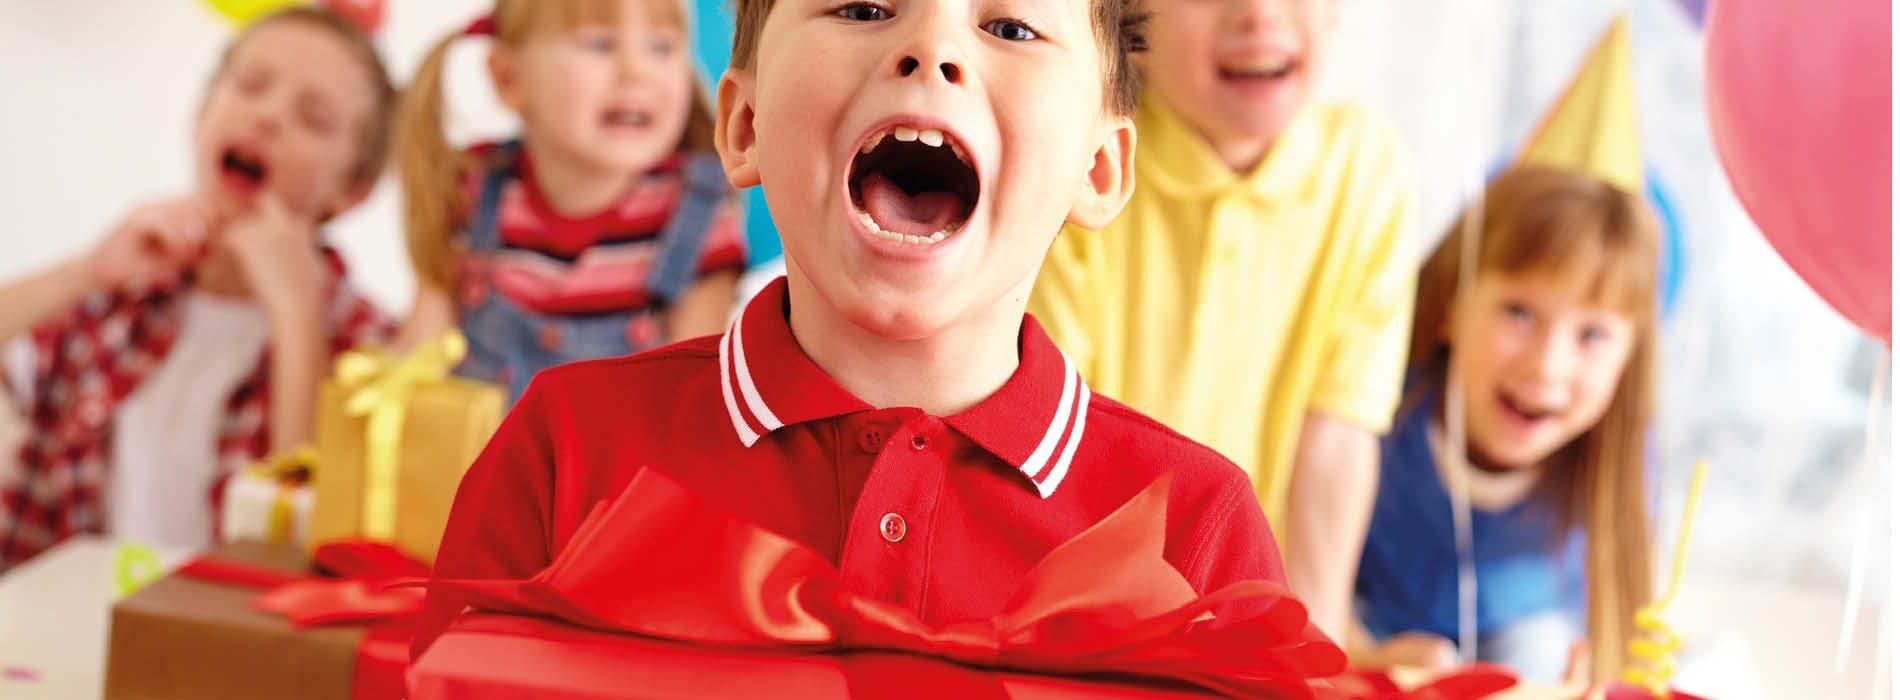 Anniversaire enfant Fun Park Colmar - Slider 2